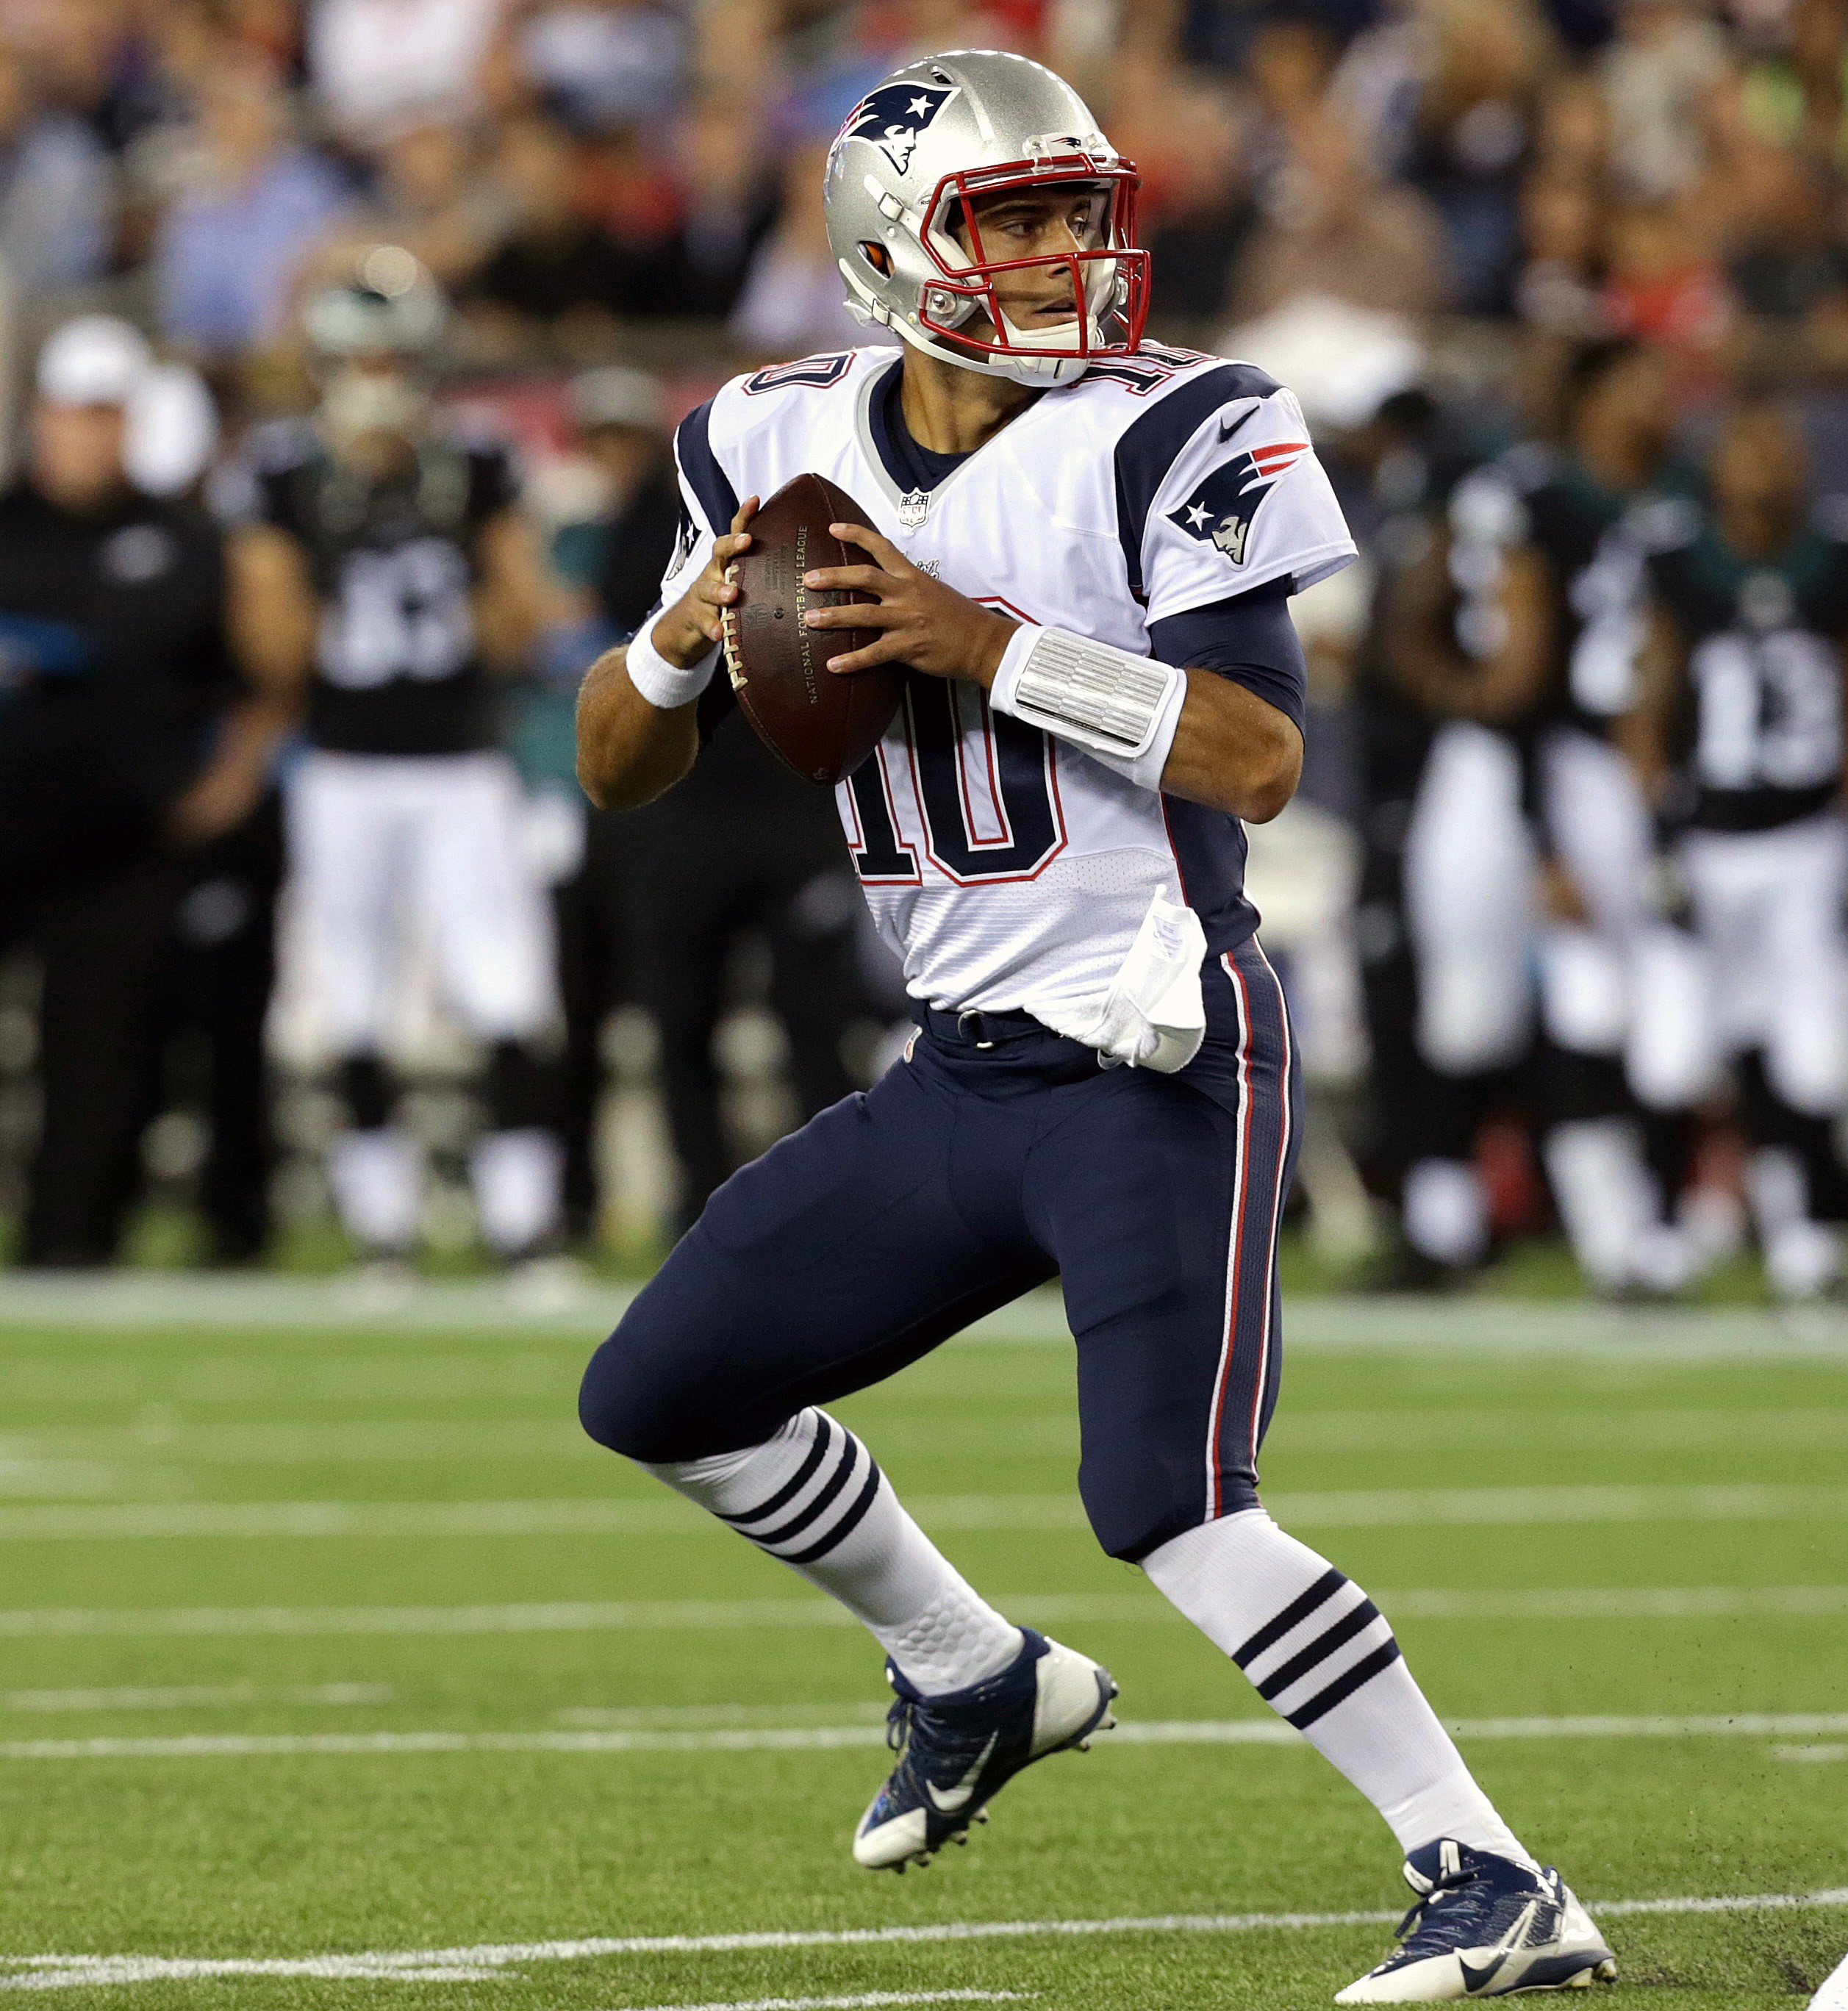 Patriots open to trading backup QB Jimmy Garoppolo